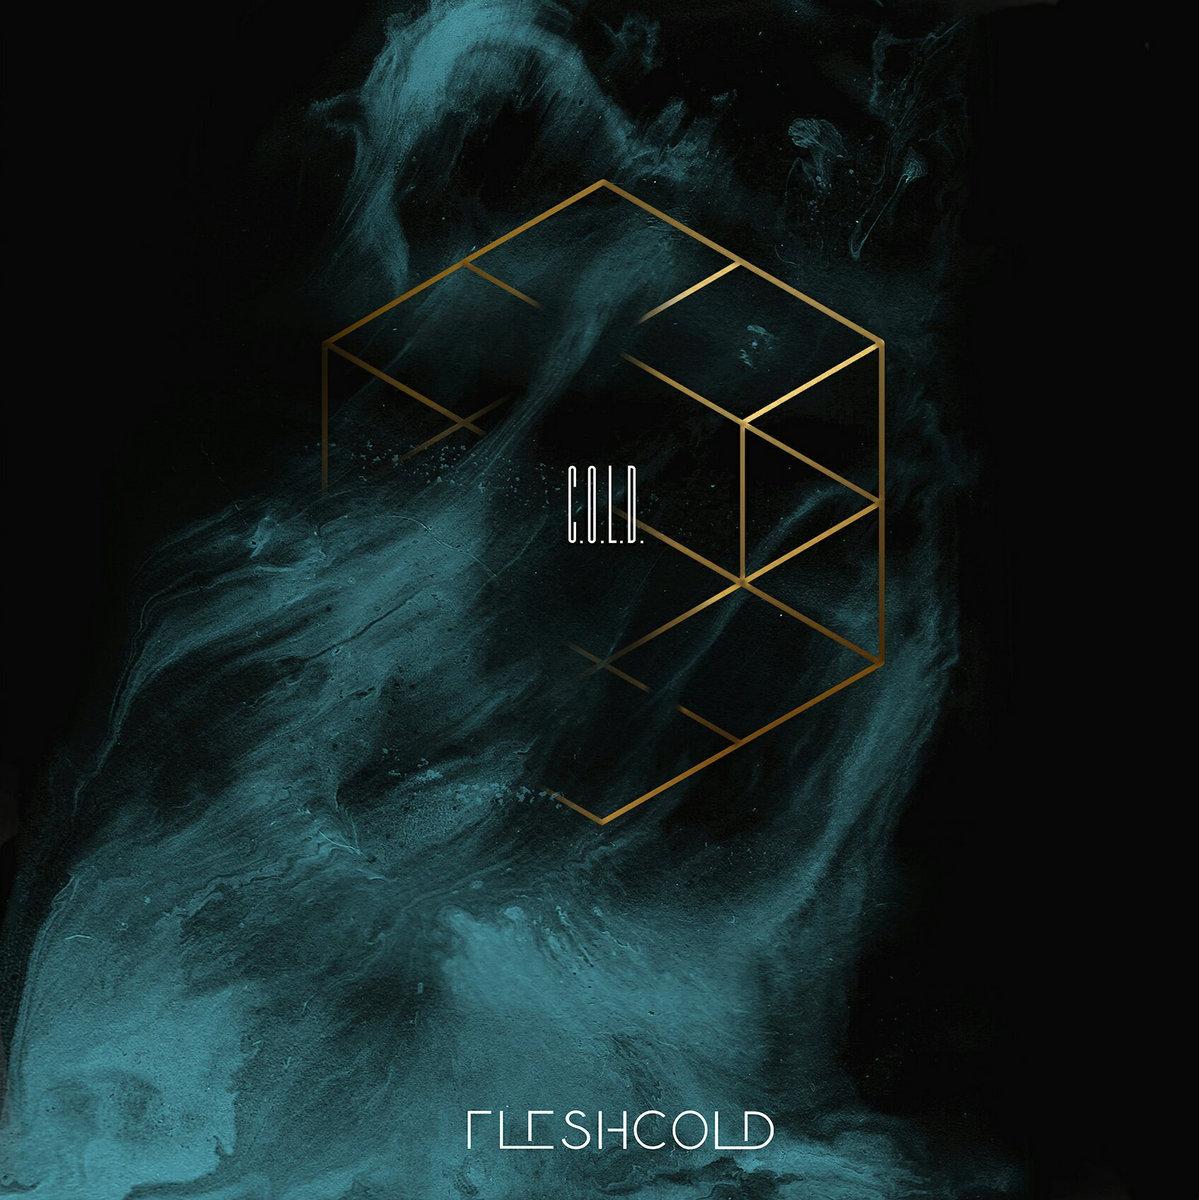 Fleshcold - C.O.L.D. [EP] (2018)